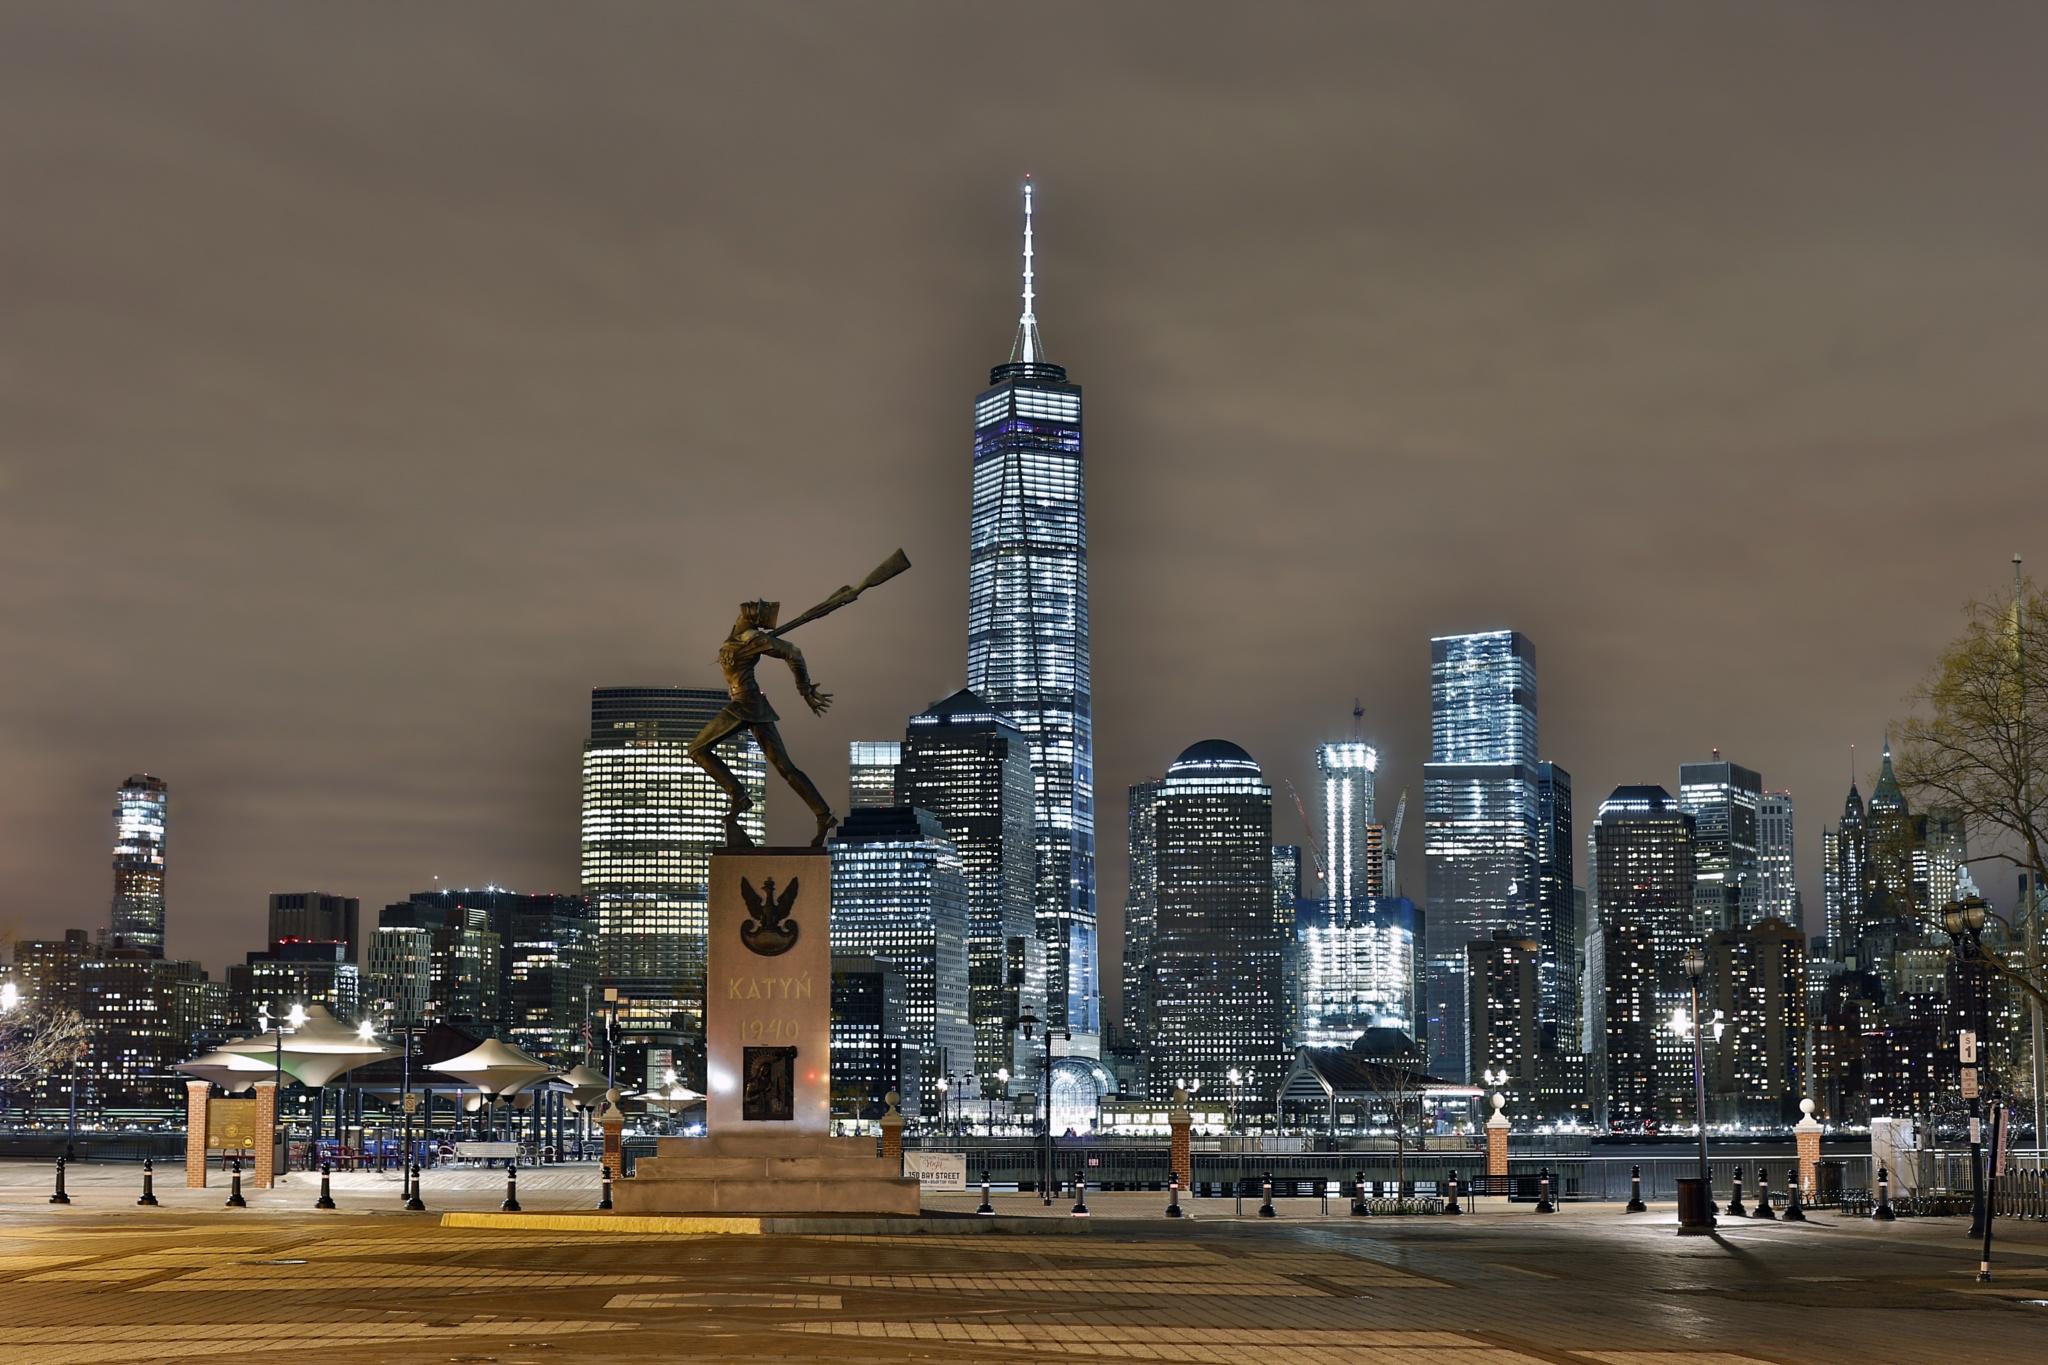 Night In Downtown Manhattan by visbimmer79